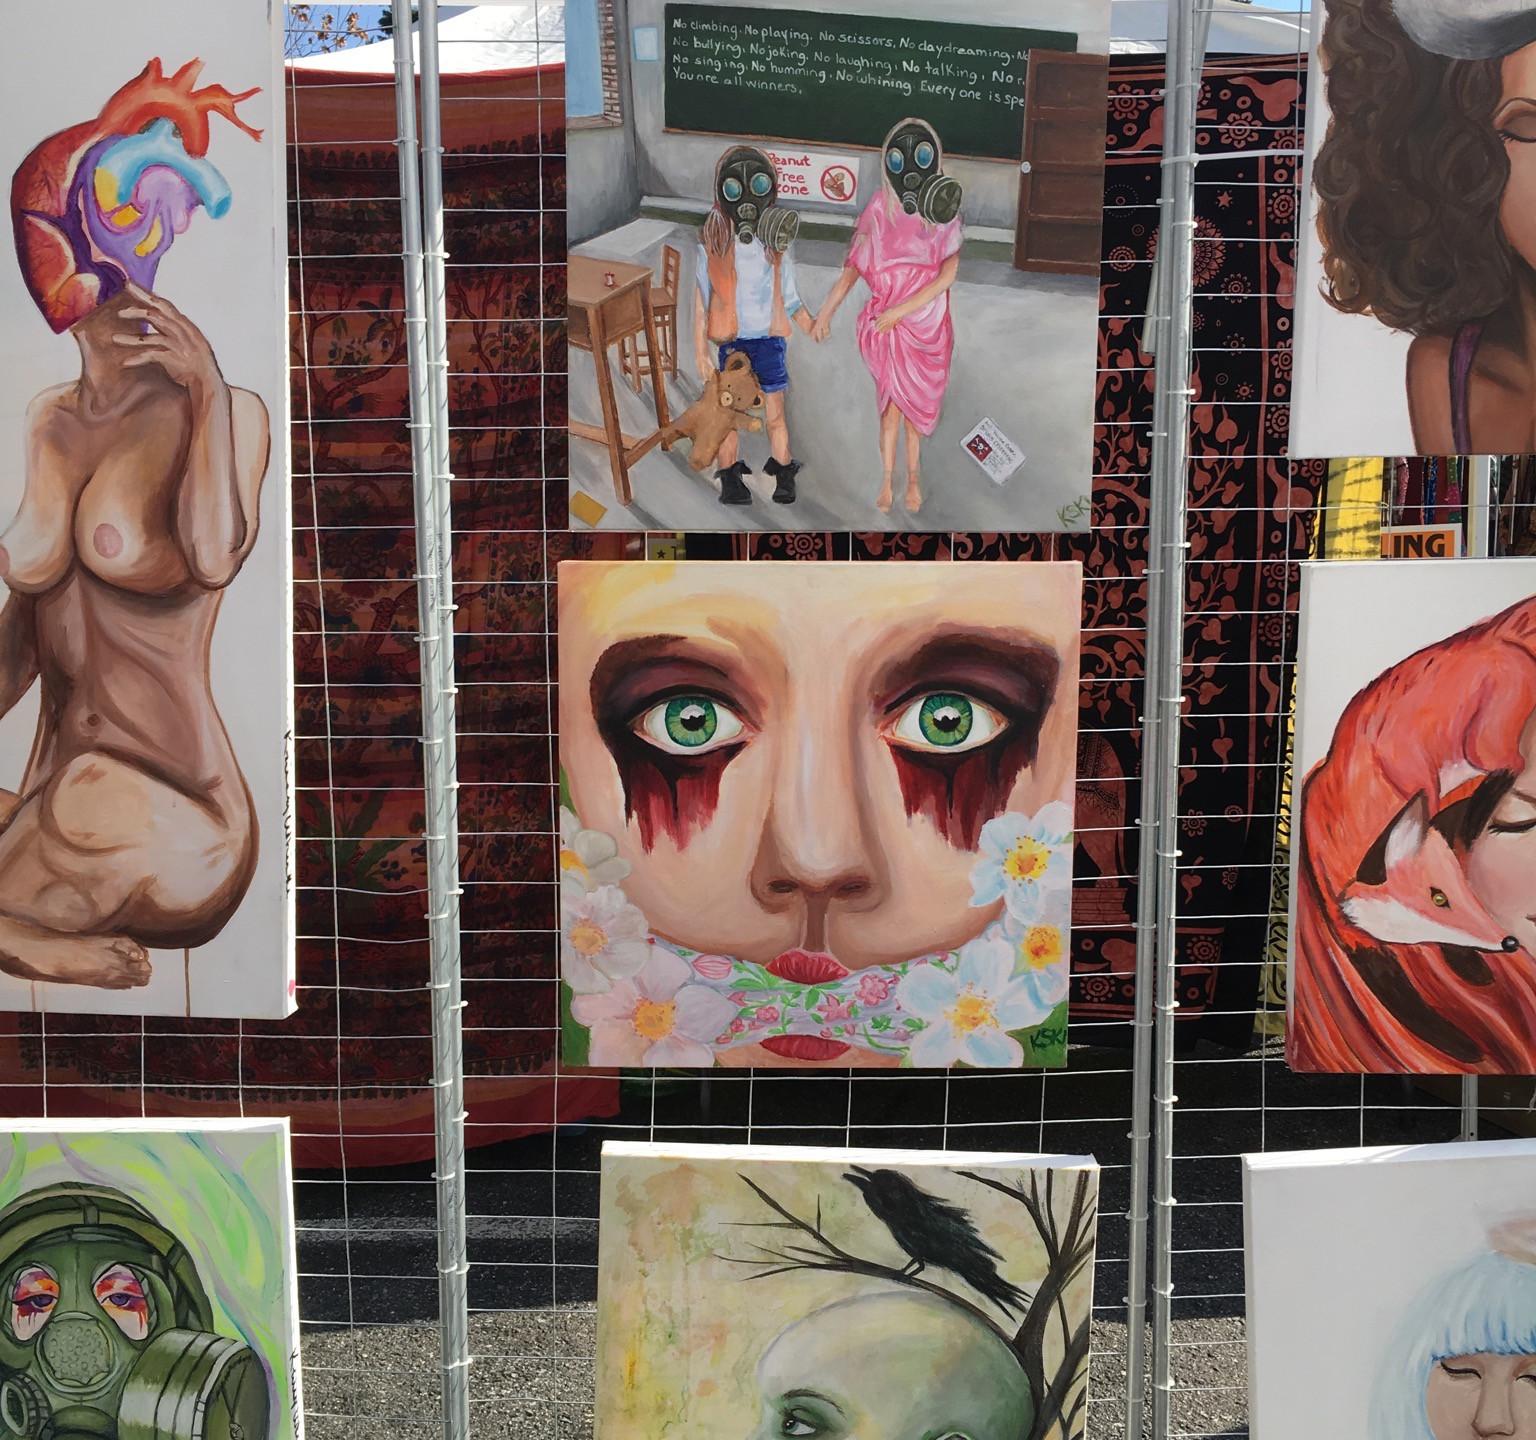 Krissy Whiski Art Show tent craft fair booth censored political mental health awareness awakening fine art